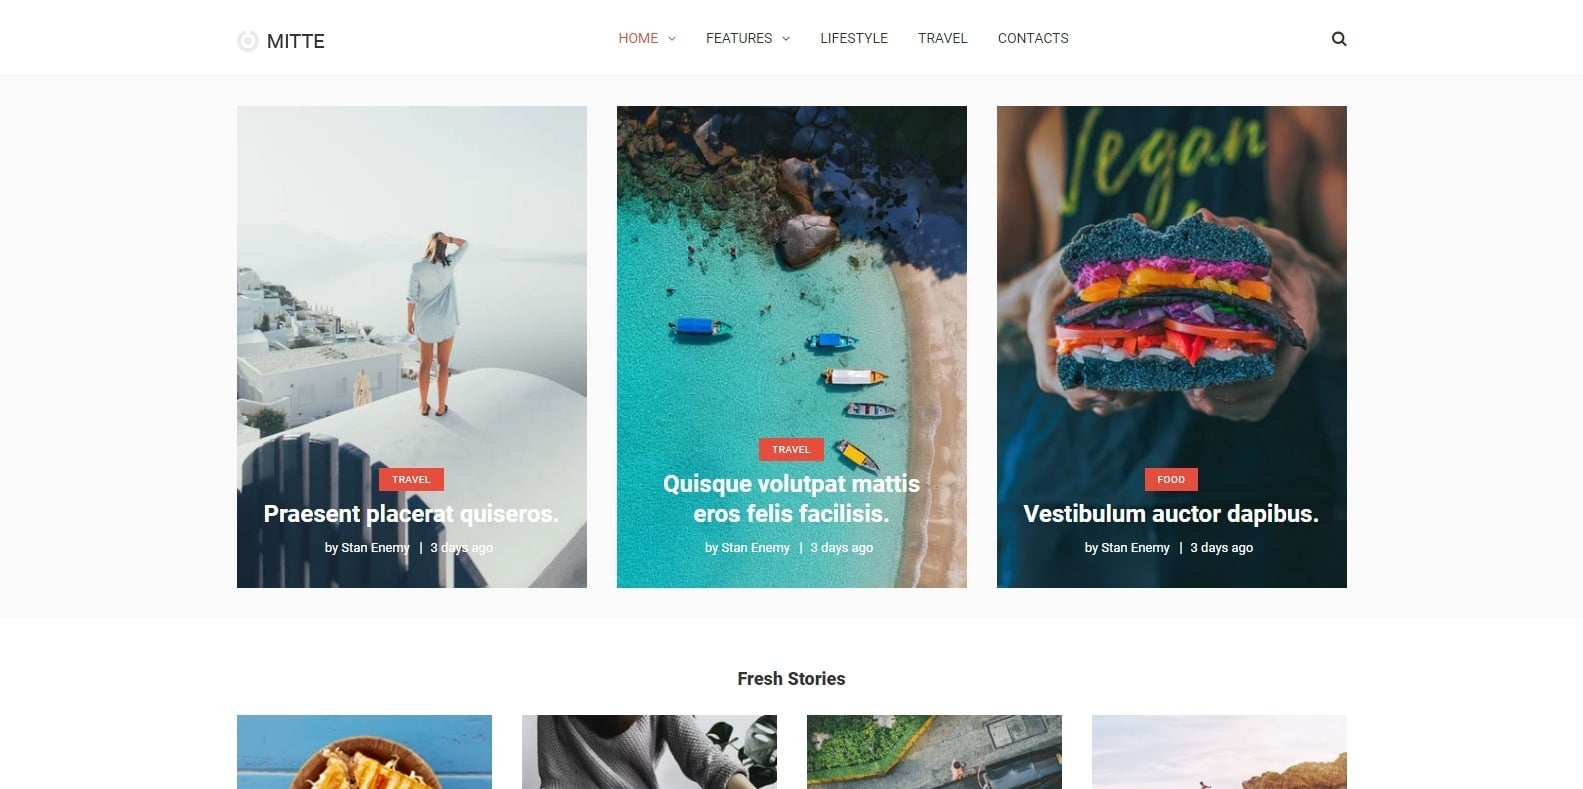 mitte-blog-website-template